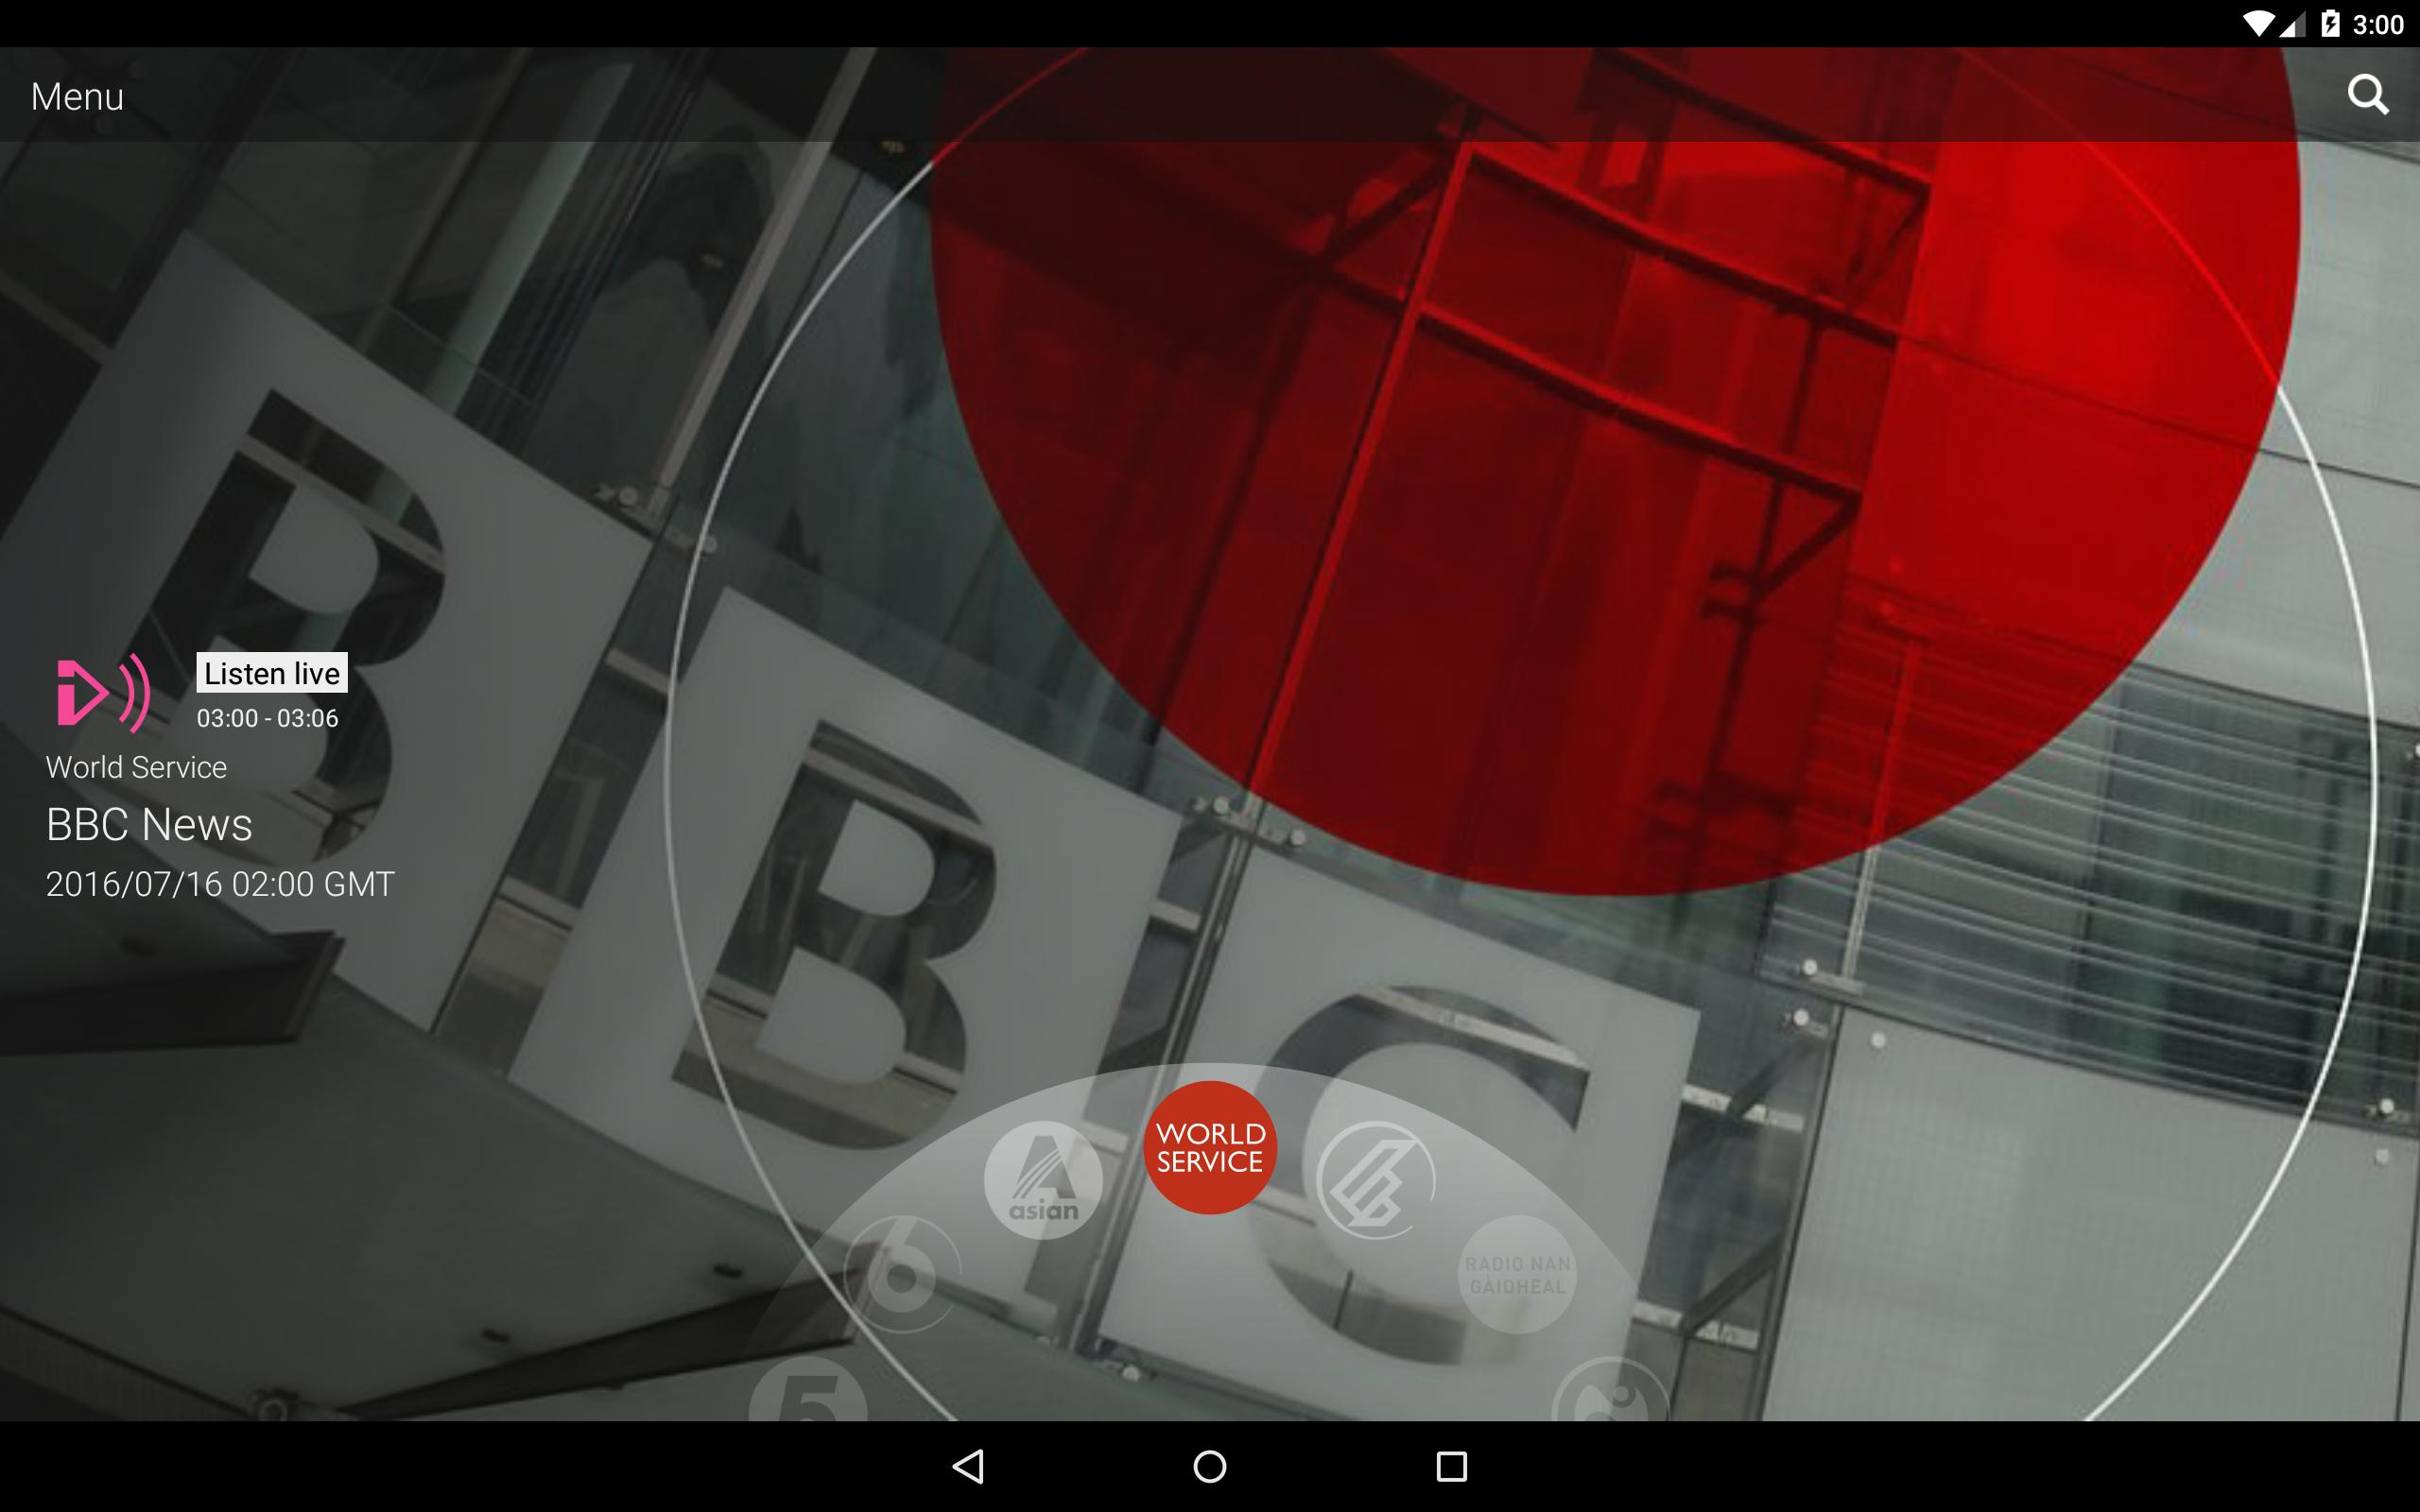 IPLAYER DOWNLOAD OFFLINE - BBC updates iPlayer Radio app for